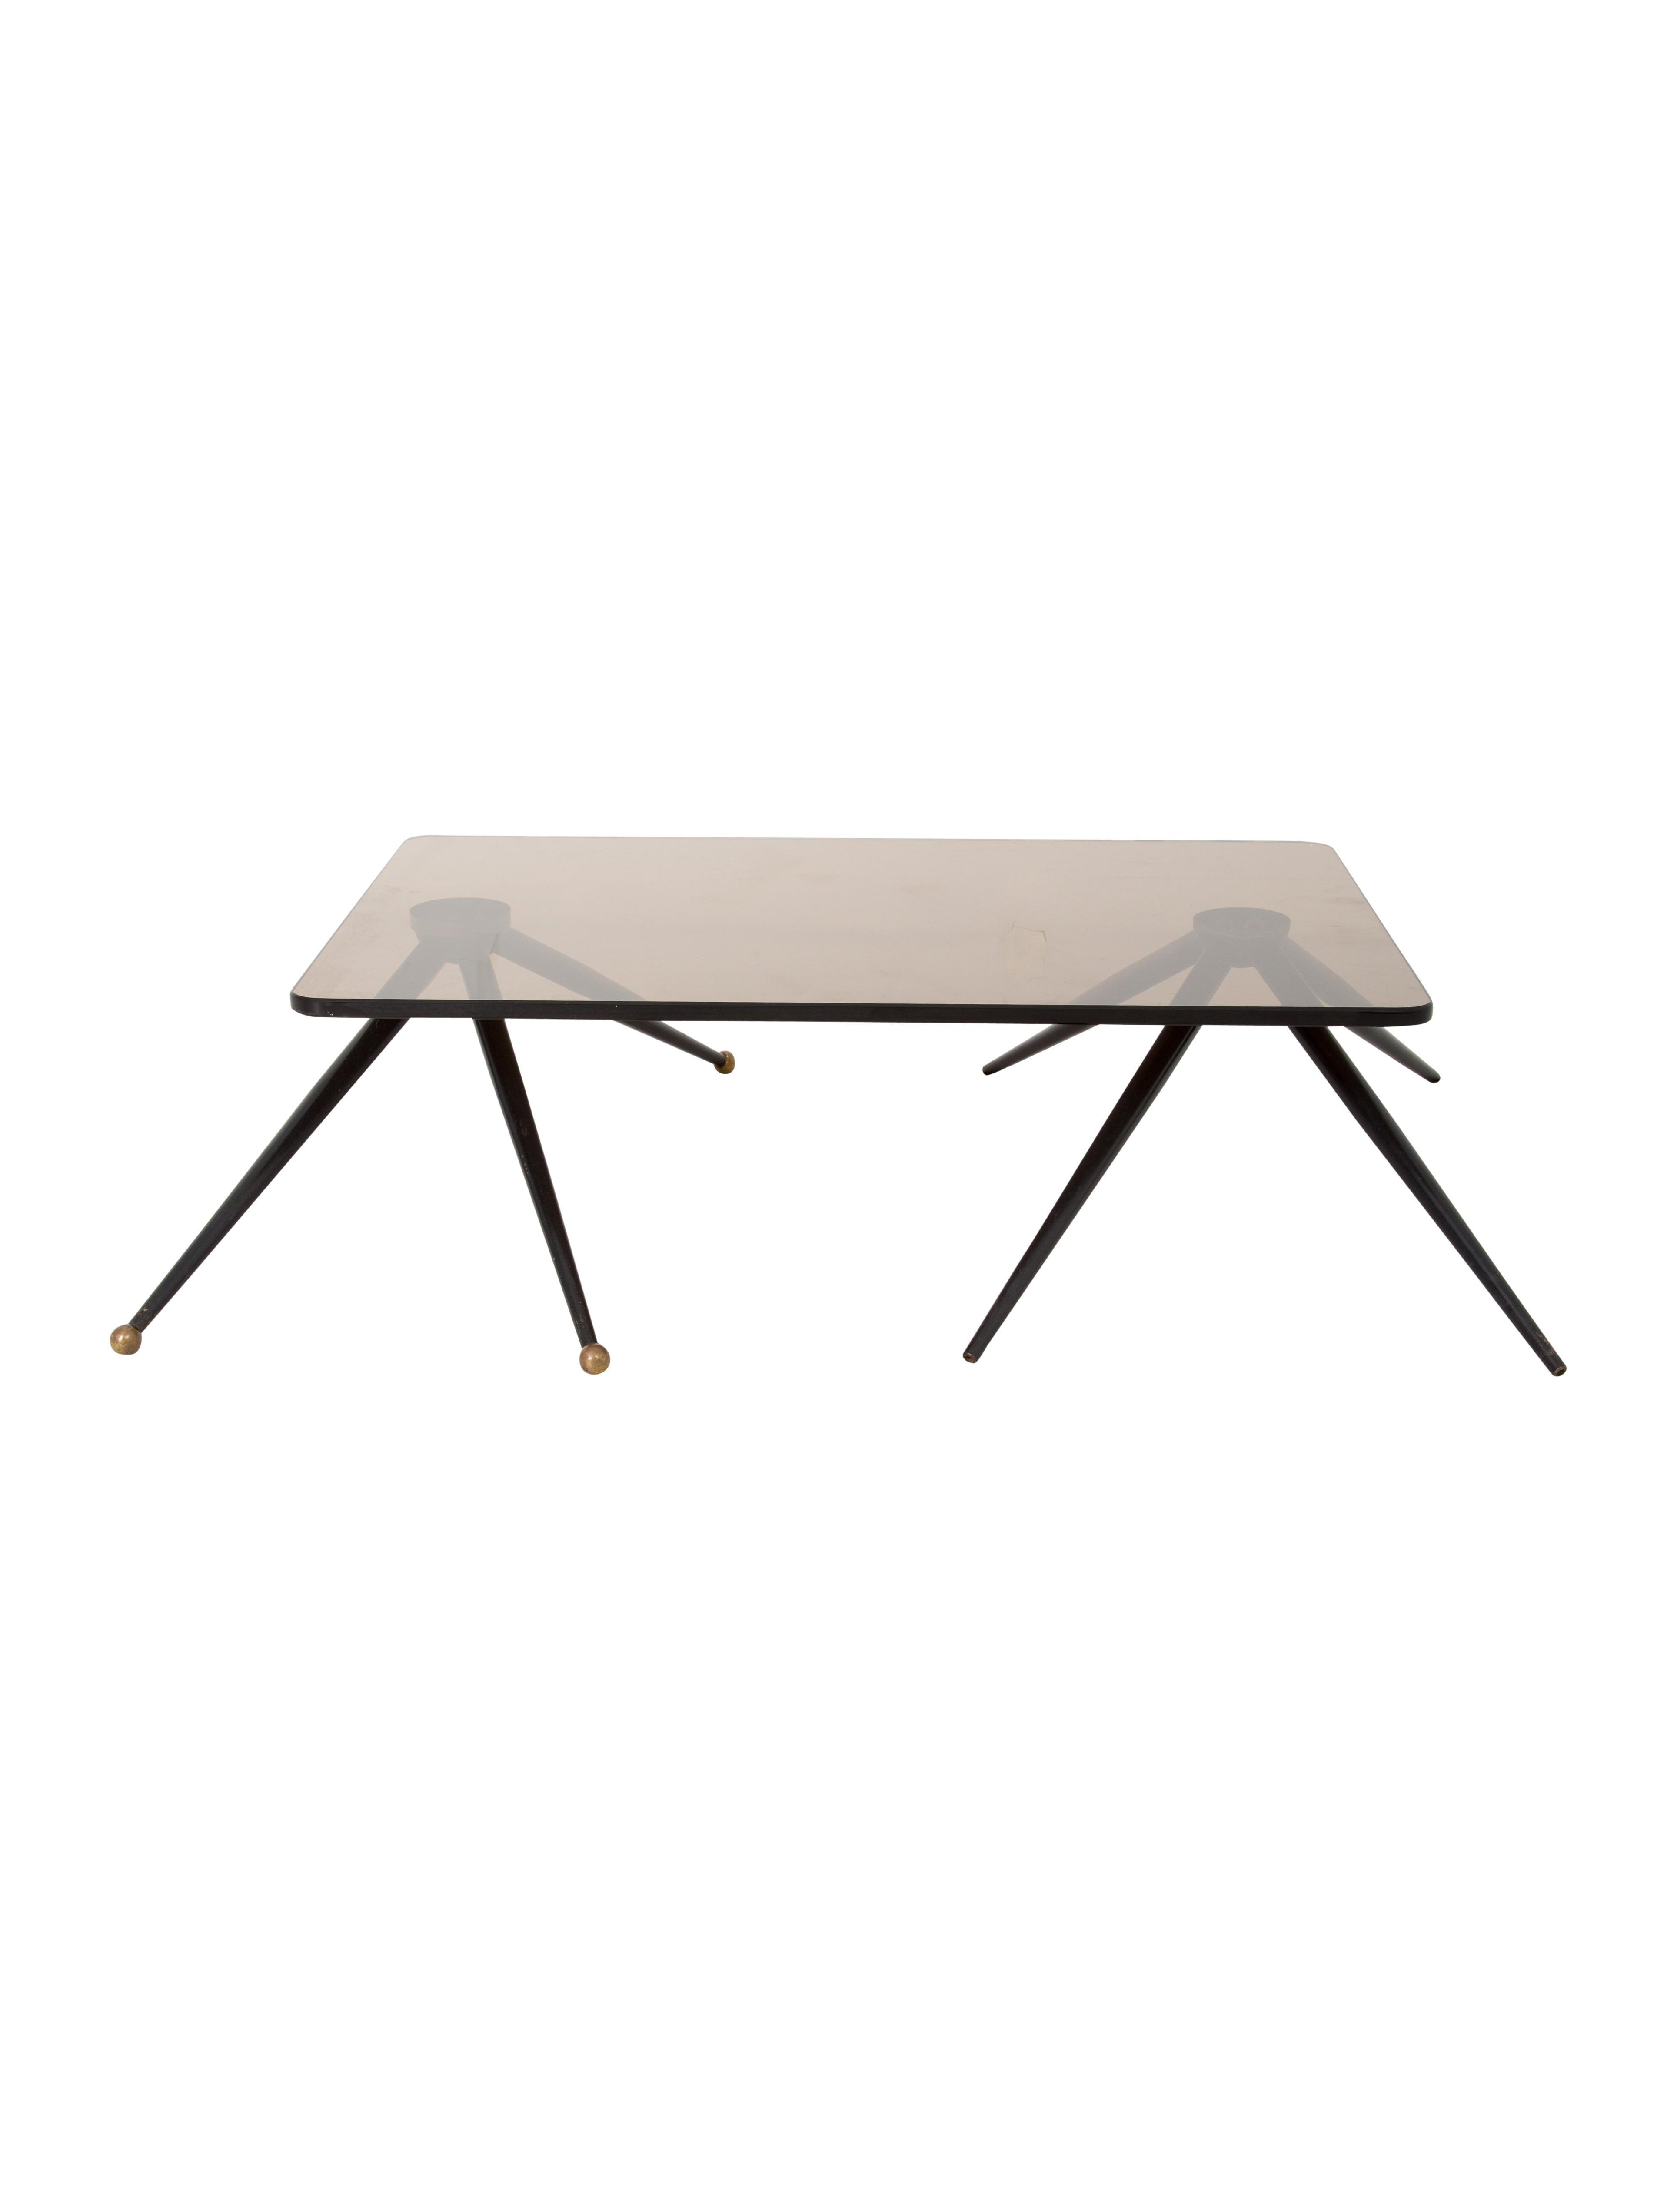 Gio Ponti Style Coffee Table Furniture Coffe20042 The Realreal